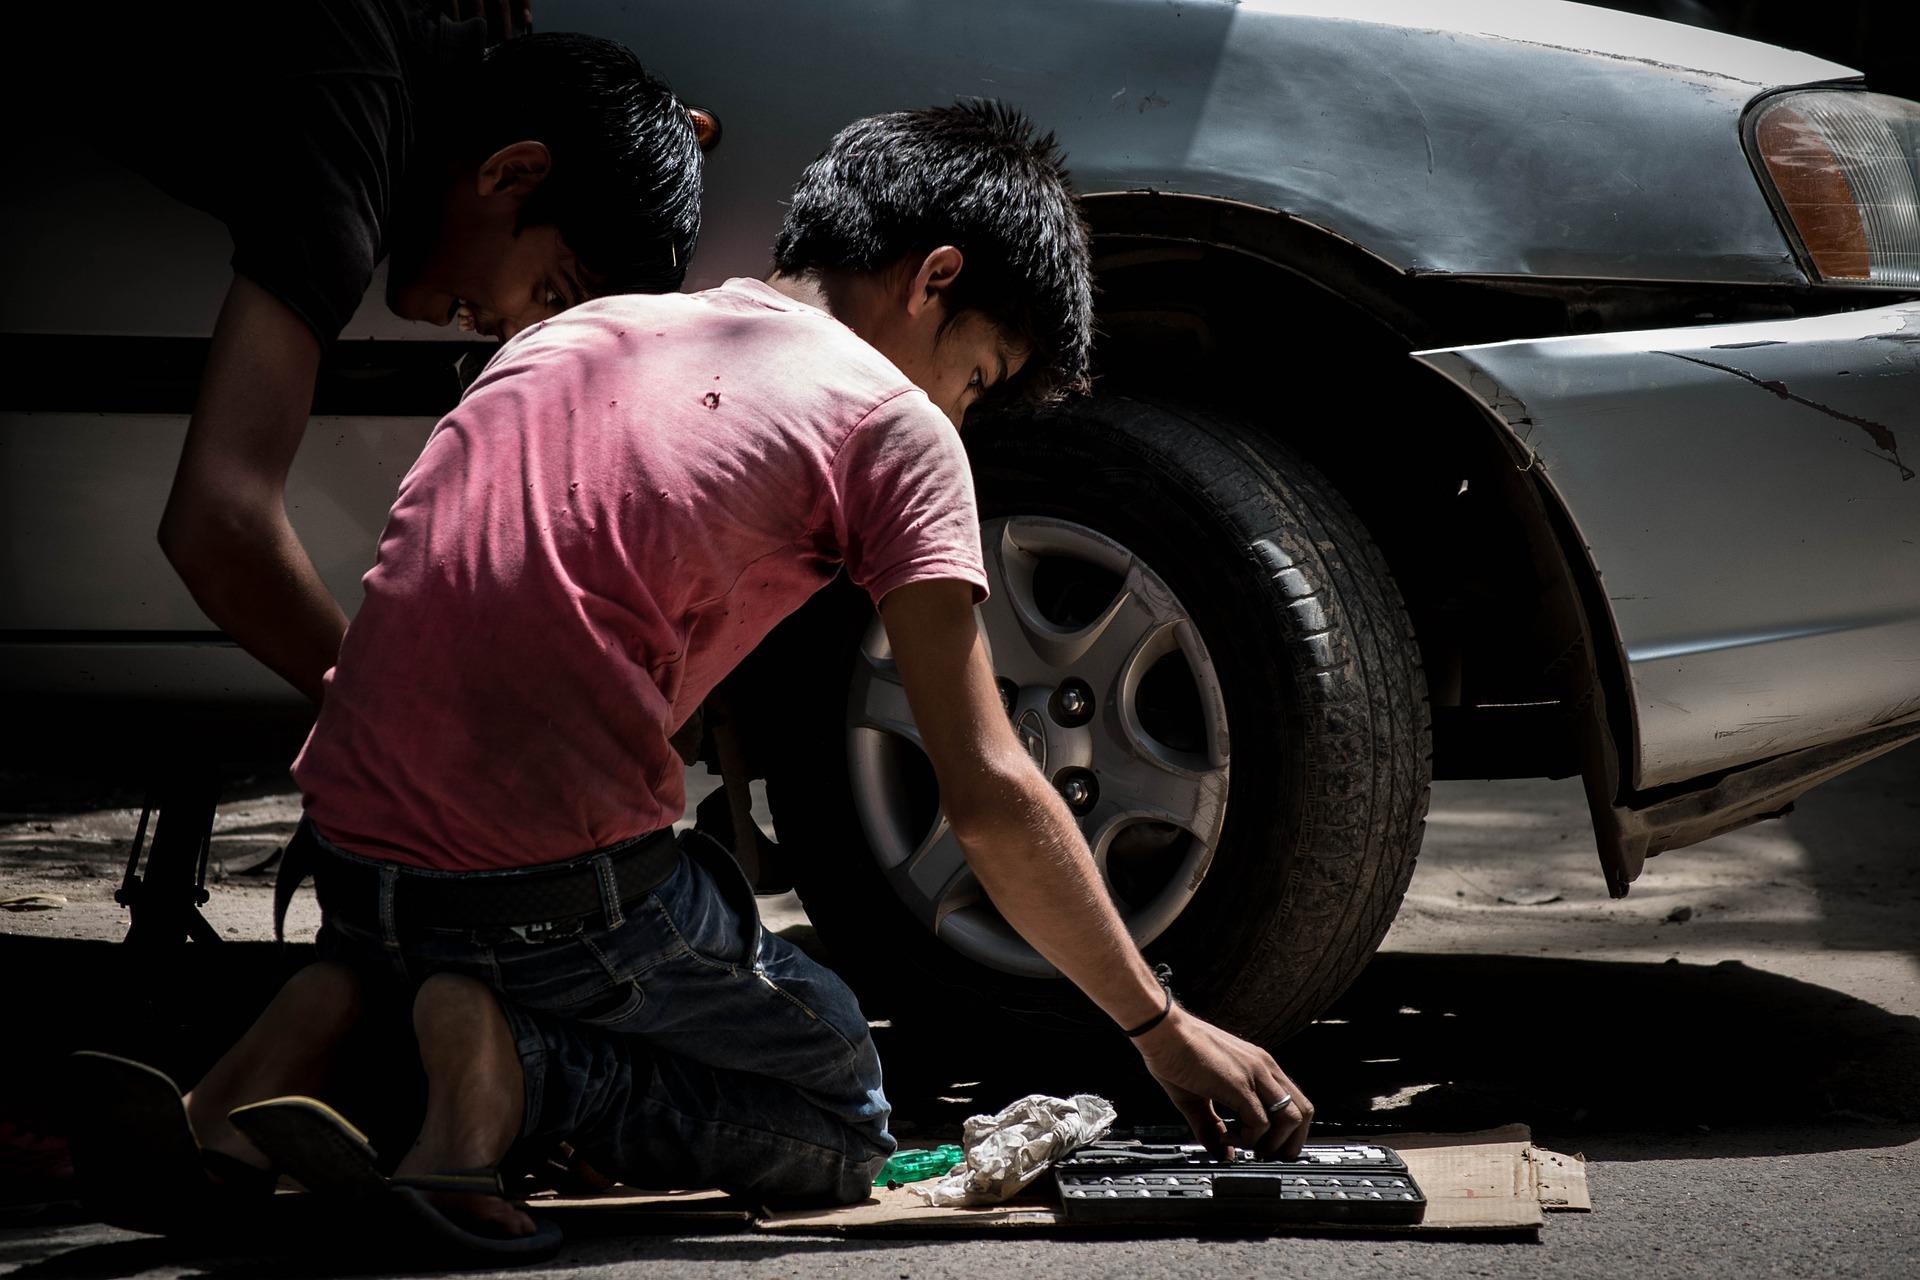 child-labor-934893_1920